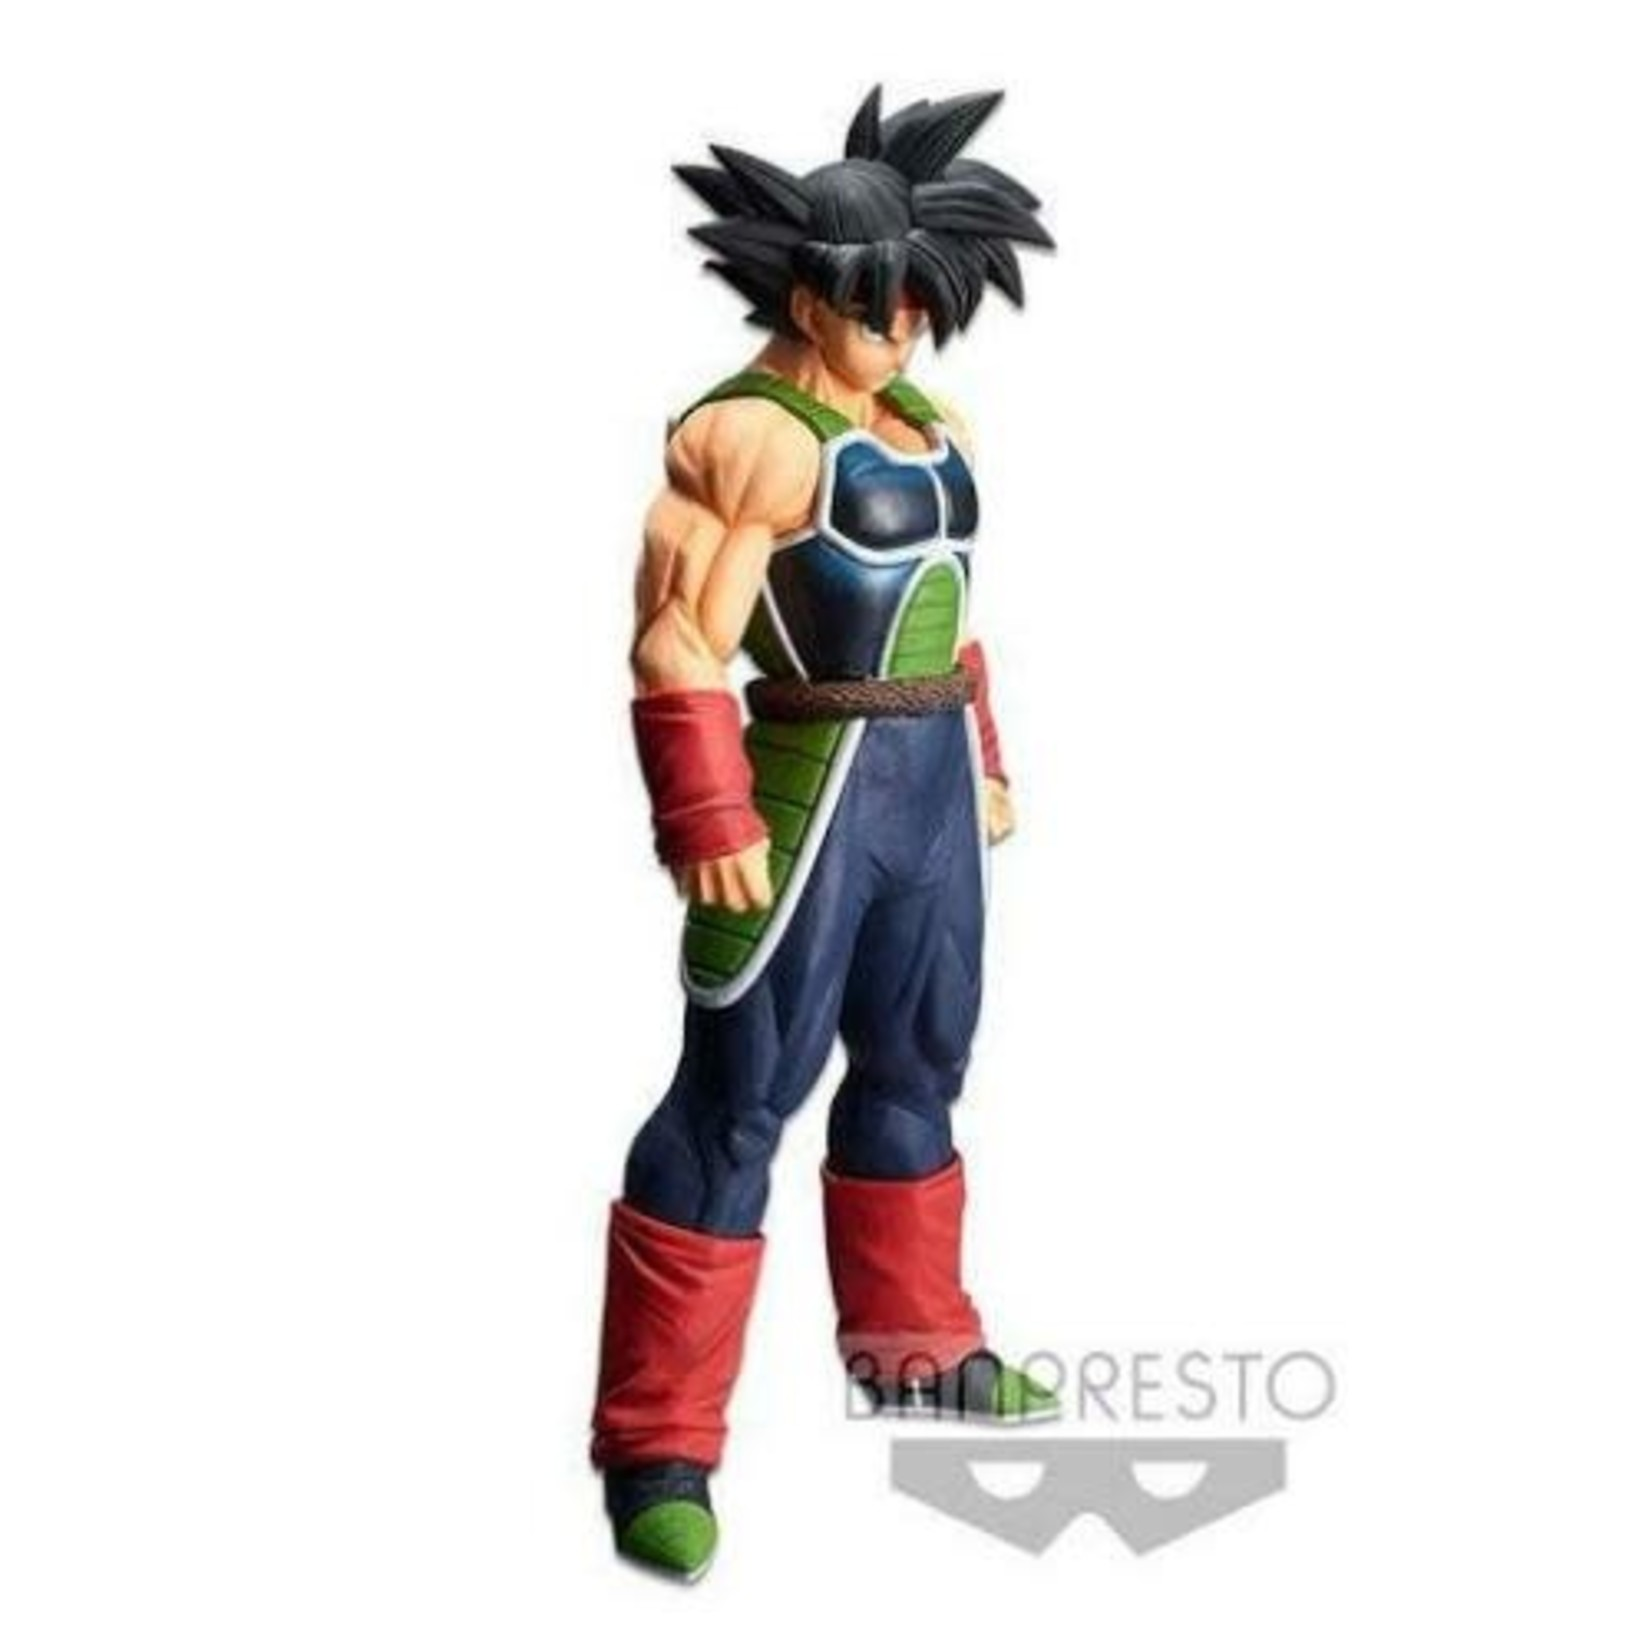 FIGURE-Dragon Ball Z Grandista nero Bardock